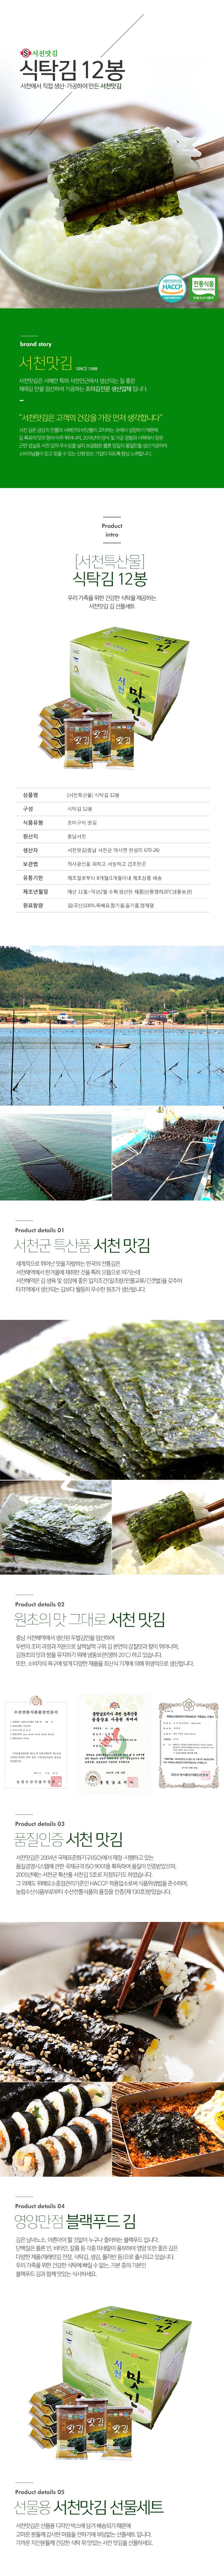 seocheonkim_03.jpg